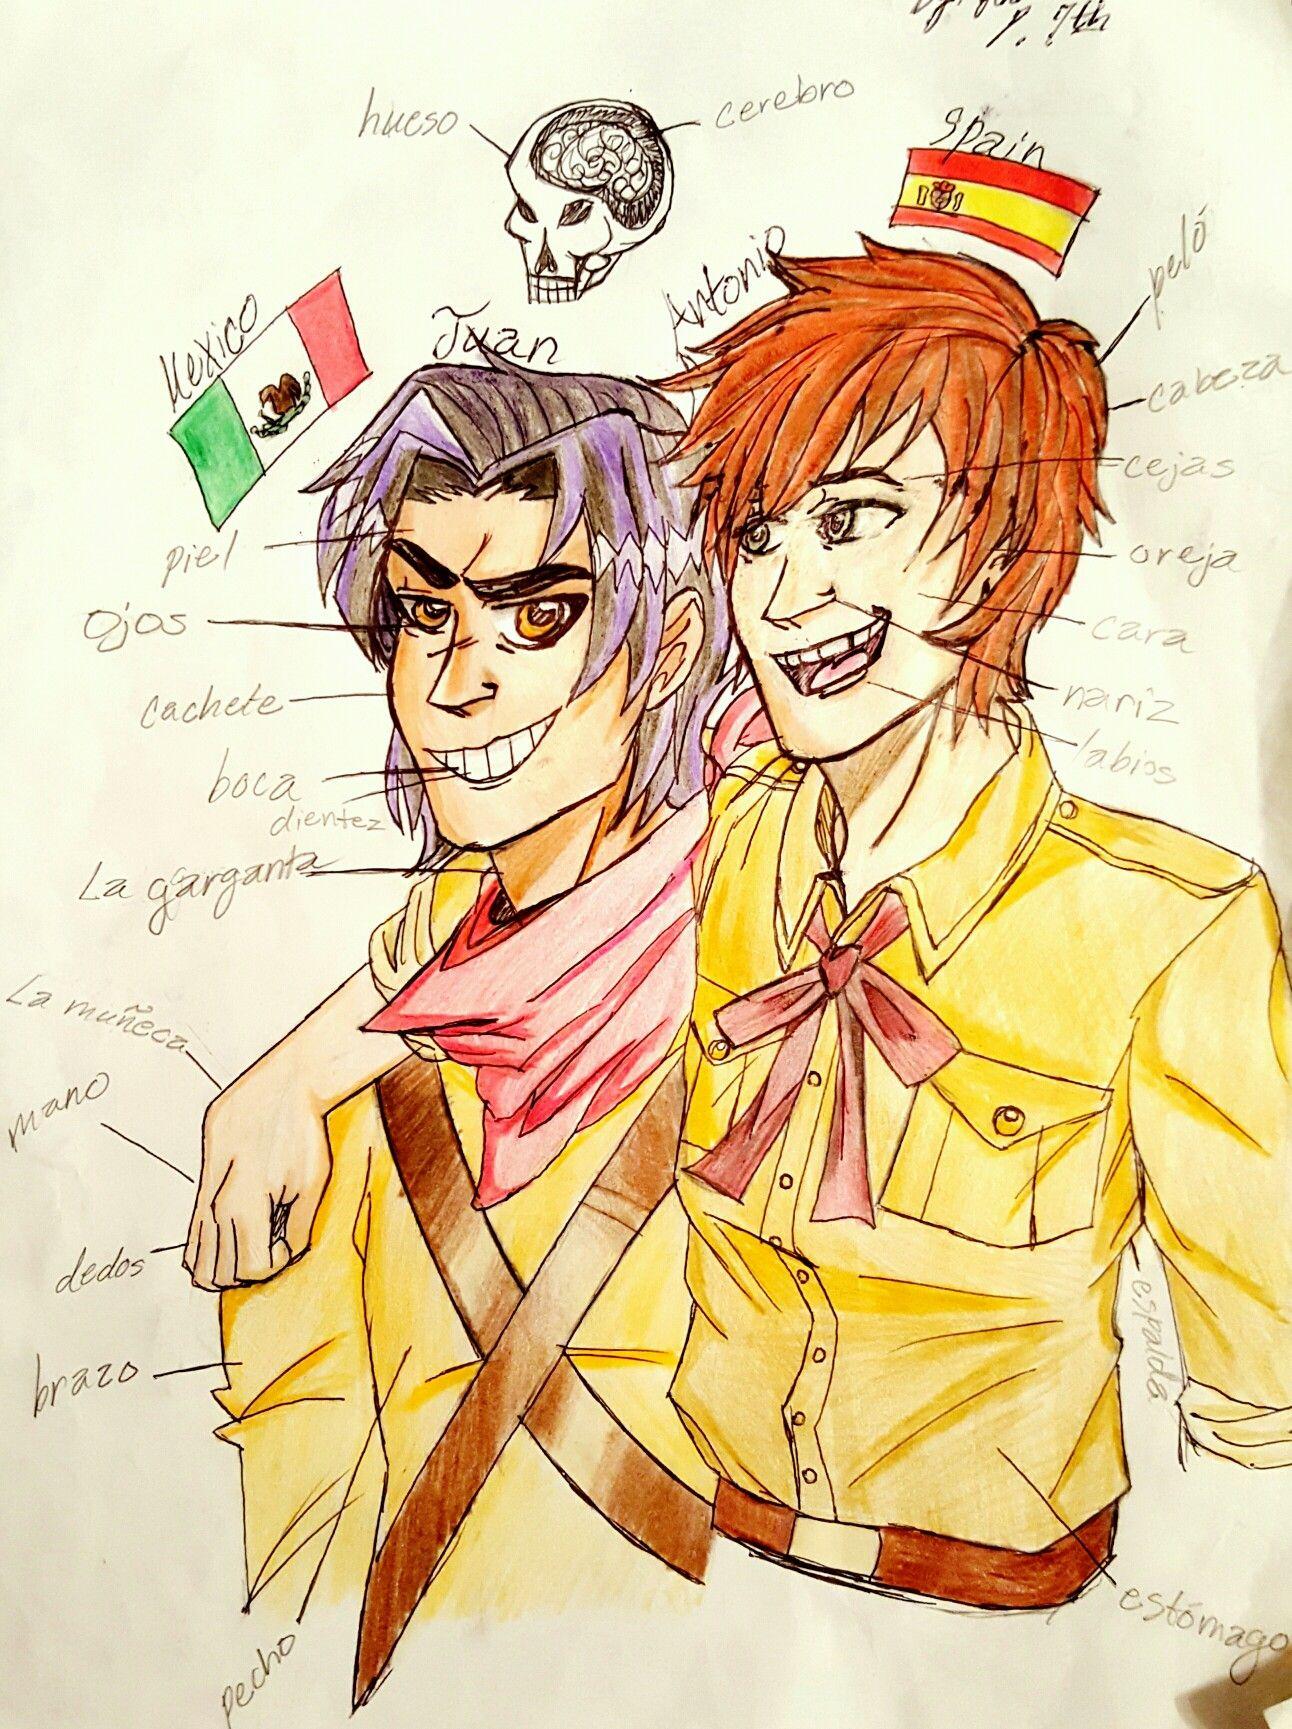 I drew Hetalia Mexico and Spain for my spainish 2 body parts